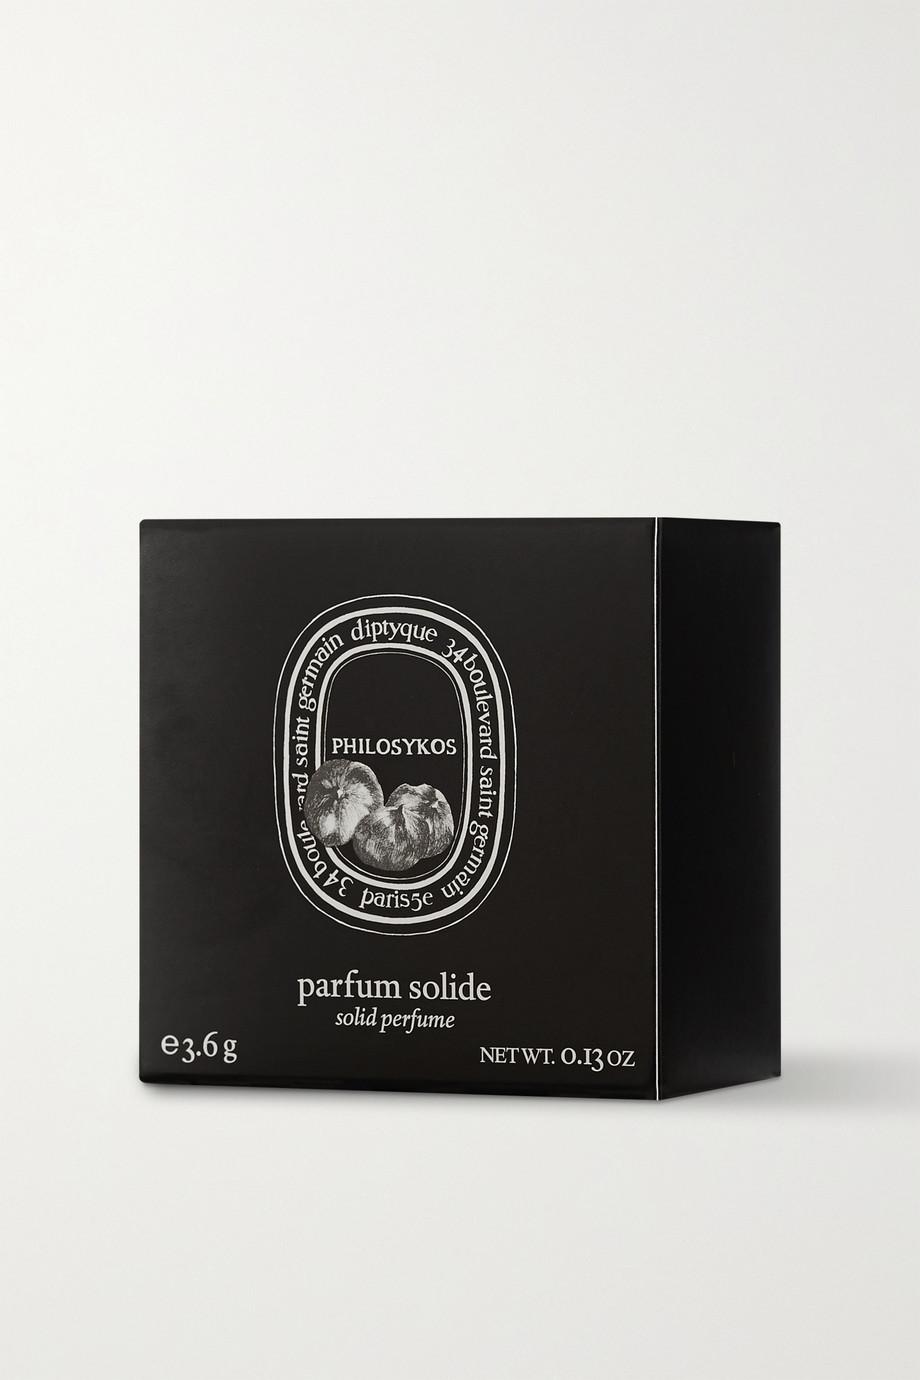 Diptyque Solid Perfume - Philosykos, 3.6g